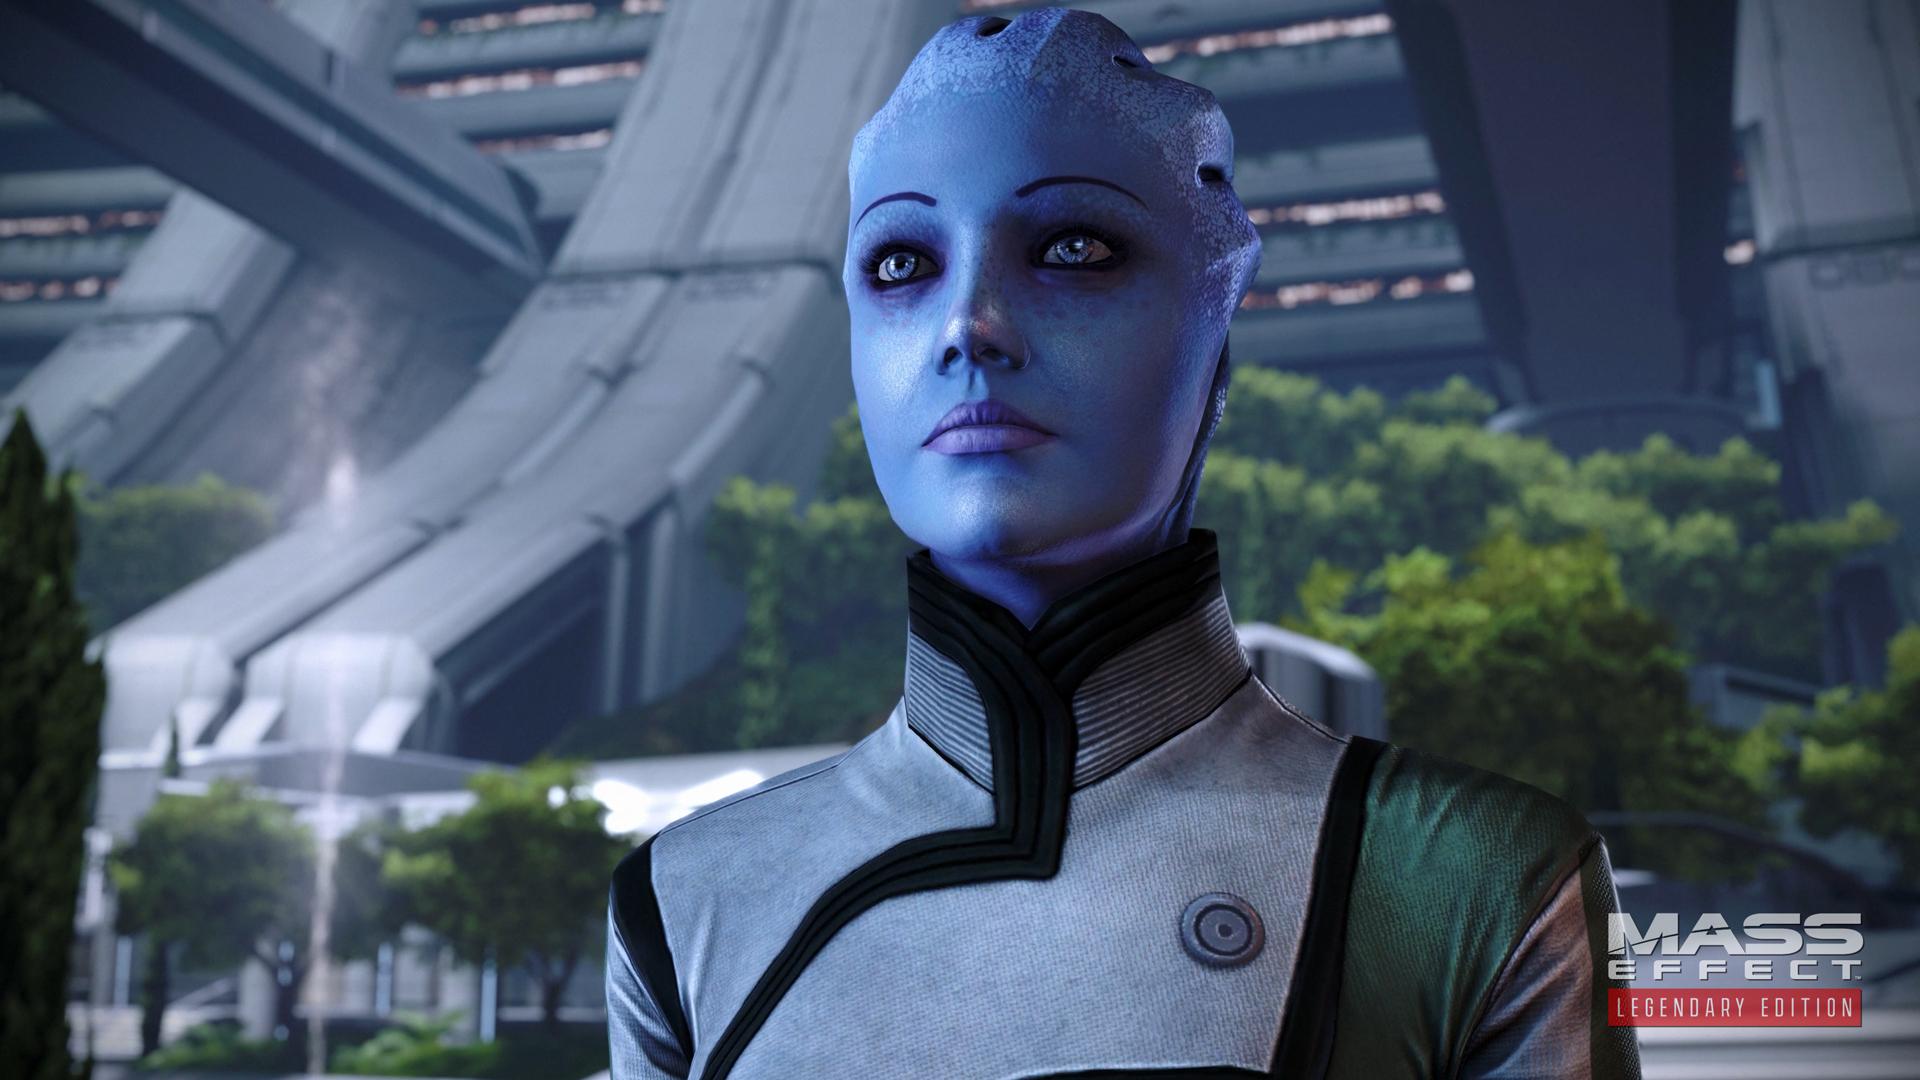 BioWare breaks down Mass Effect: Legendary Edition's visual overhaul